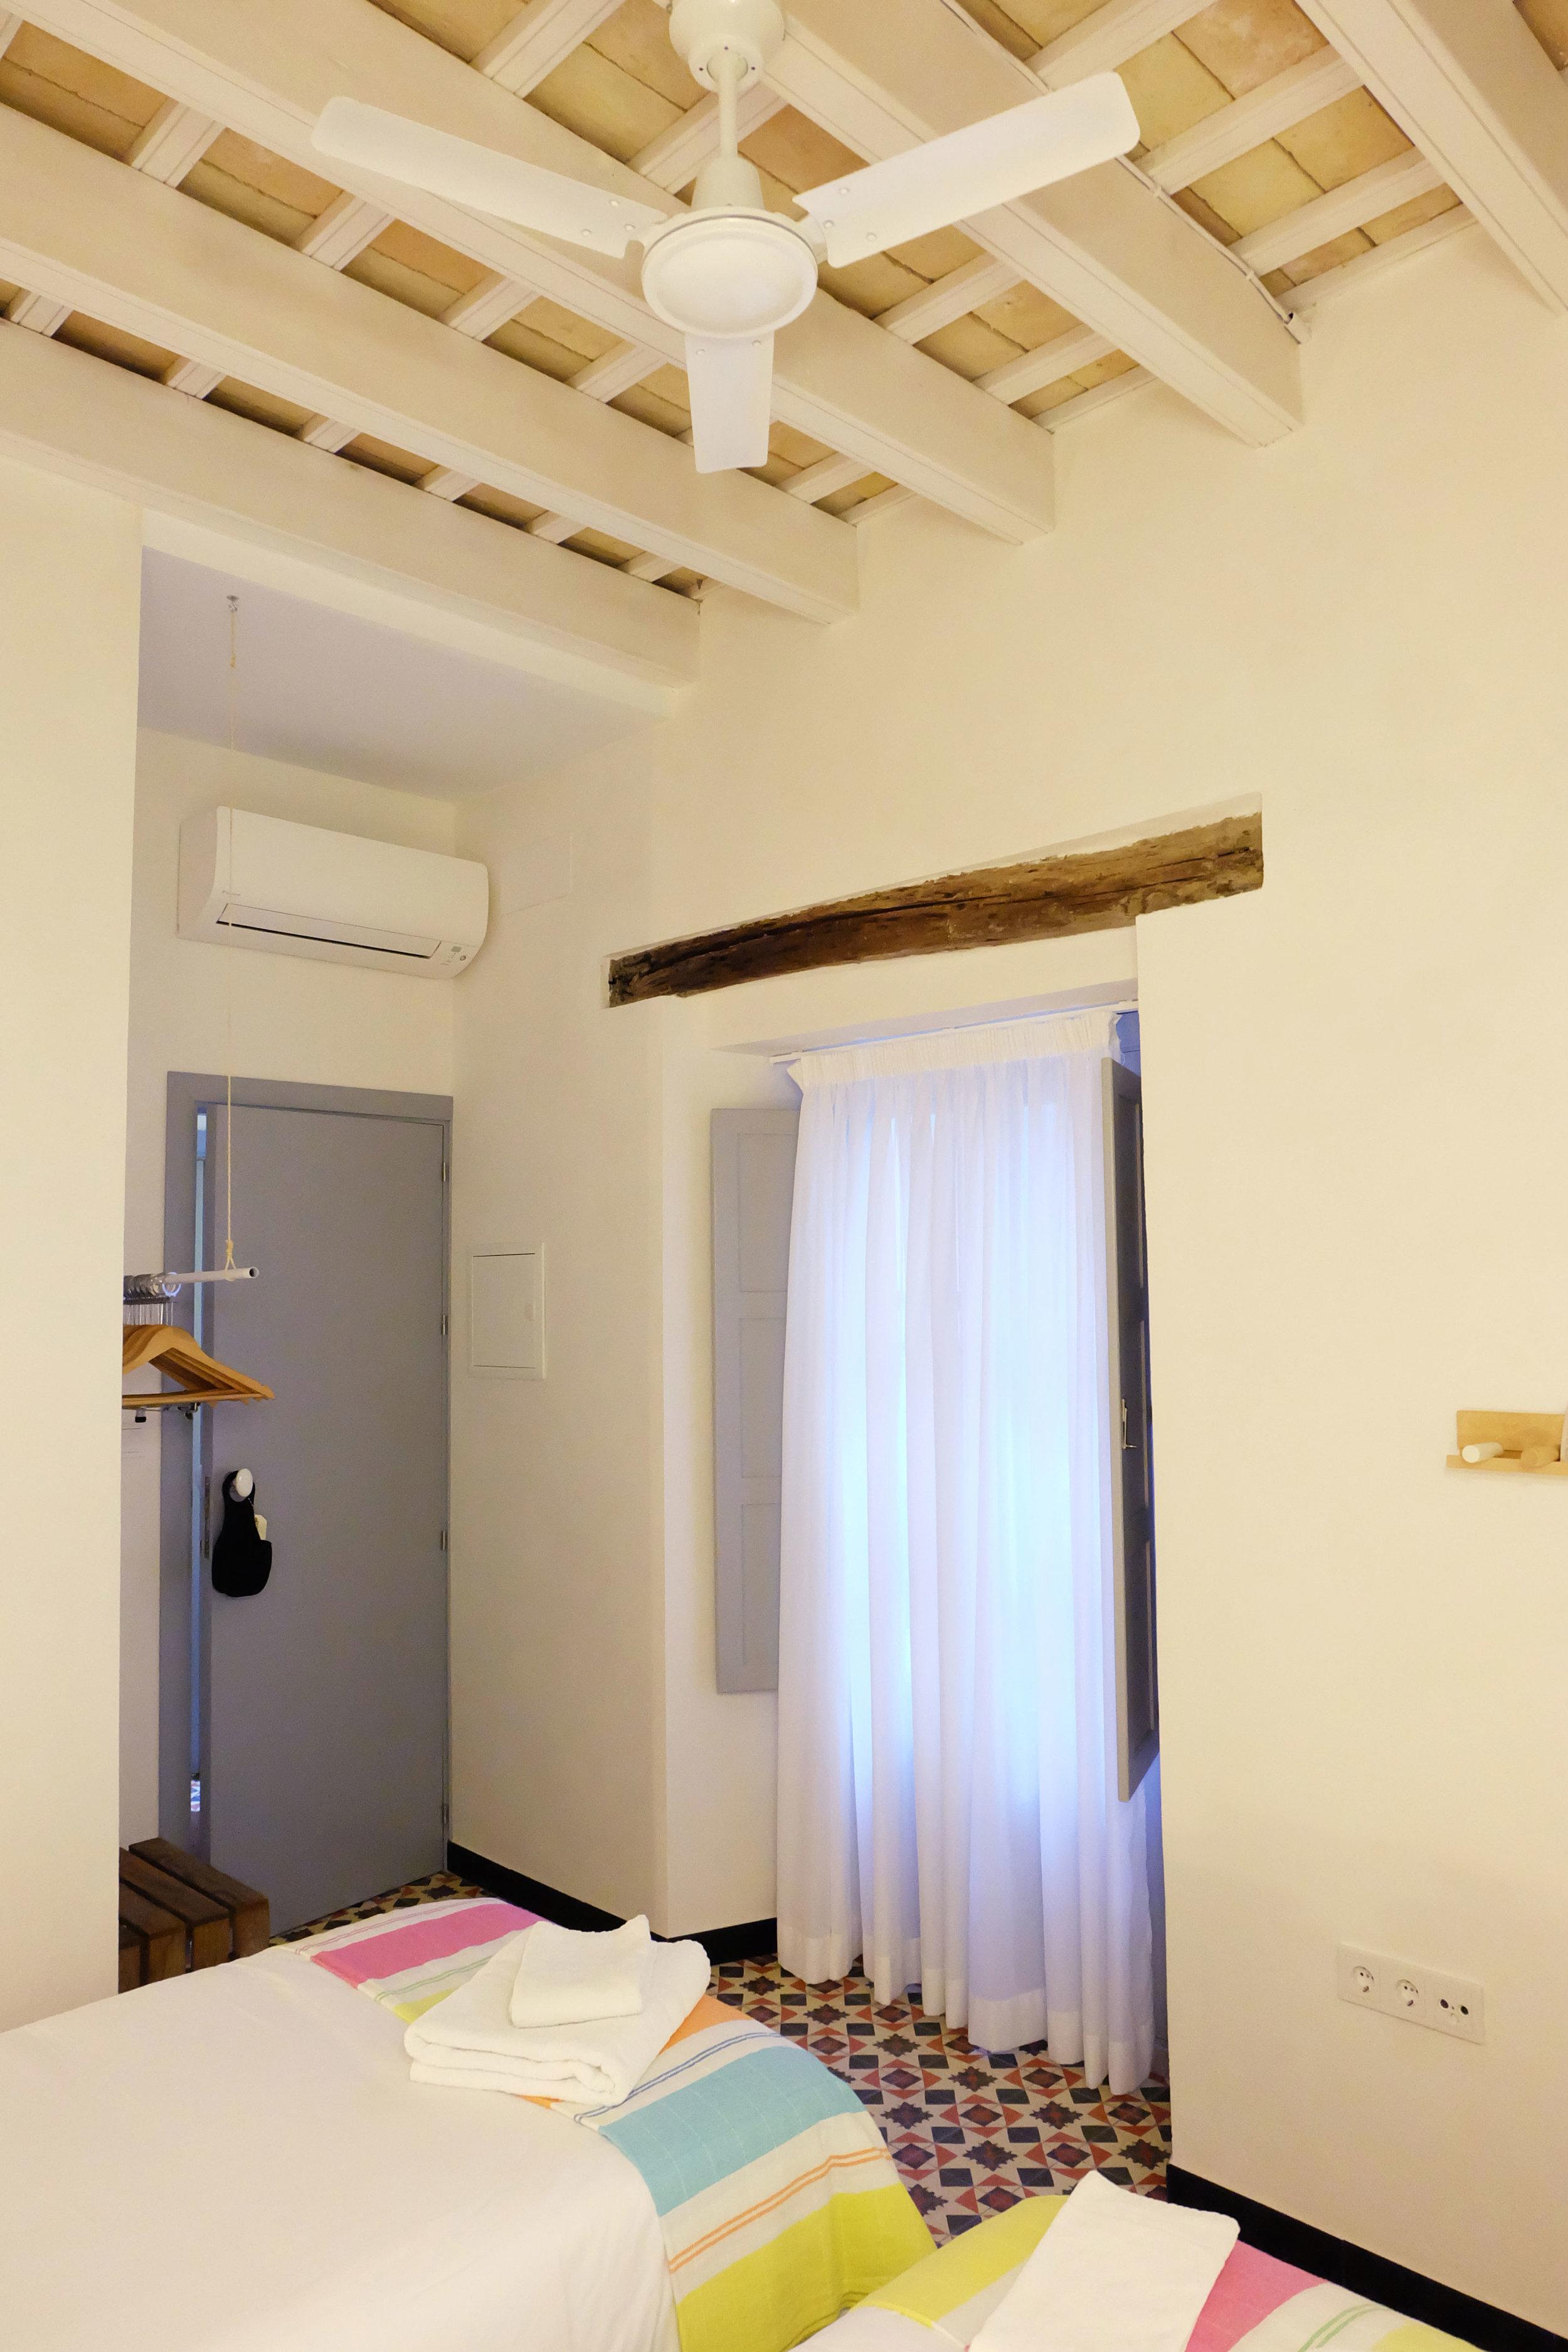 Hotel-Casa-de-Huespedes-Santa-Maria-Habitacion-2-3.jpg